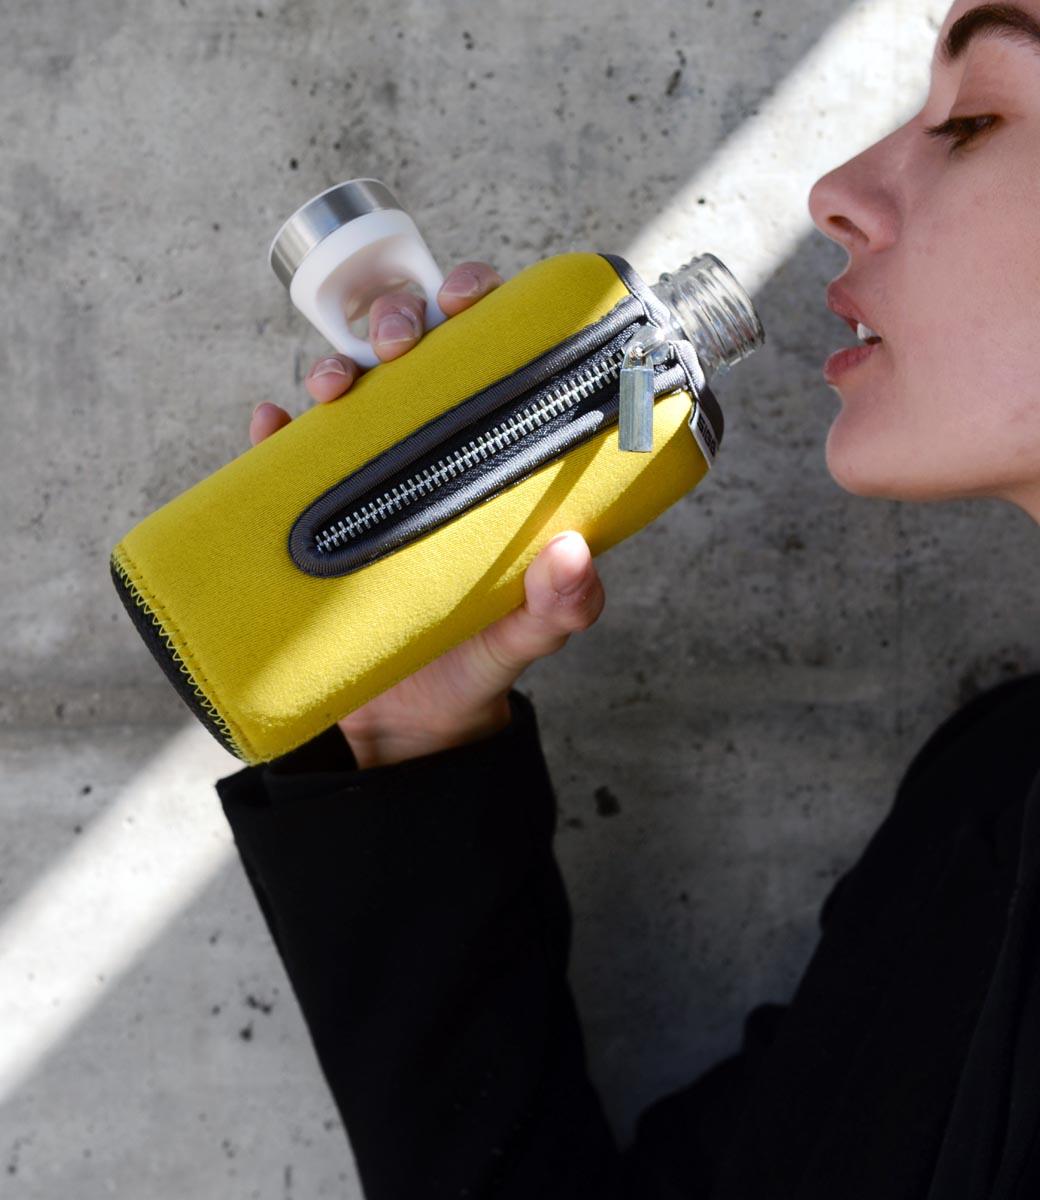 SIGG STELLA 系列 Neoprene 黃色潛水布套實驗室級玻璃水壺